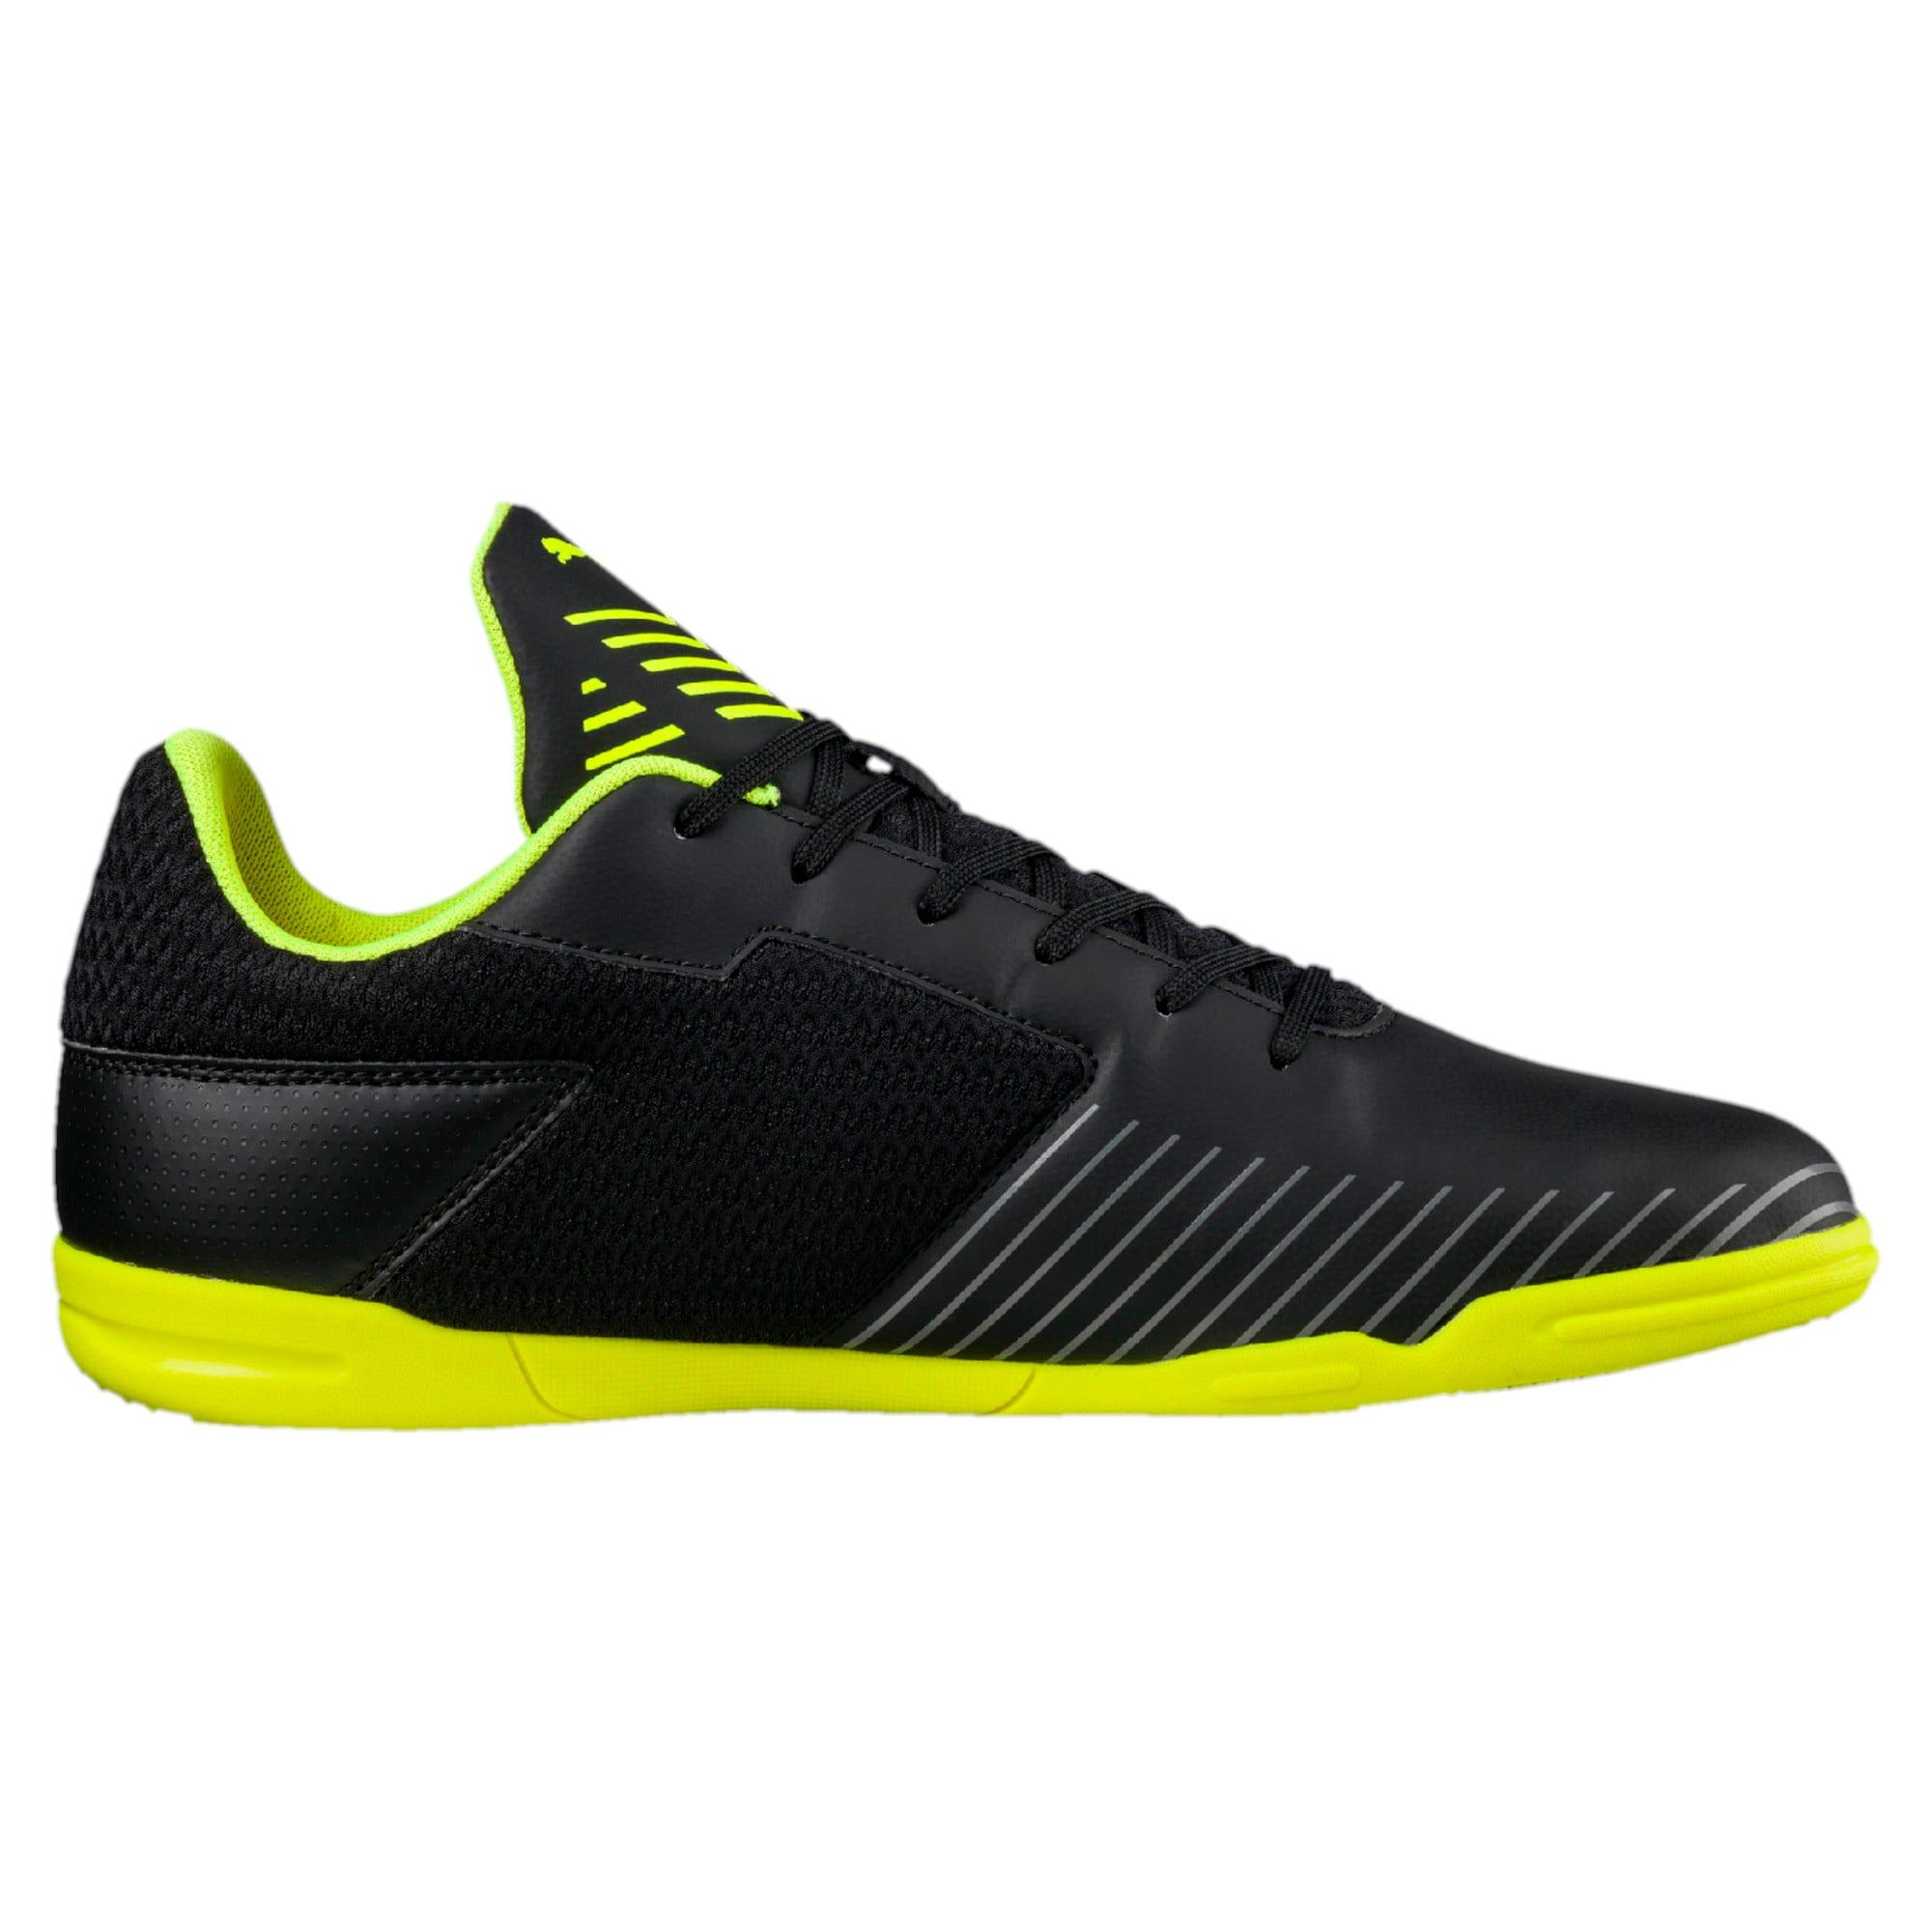 Thumbnail 5 of 365 CT Men's Court Football Shoes, Black-Black-Yellow-White, medium-IND